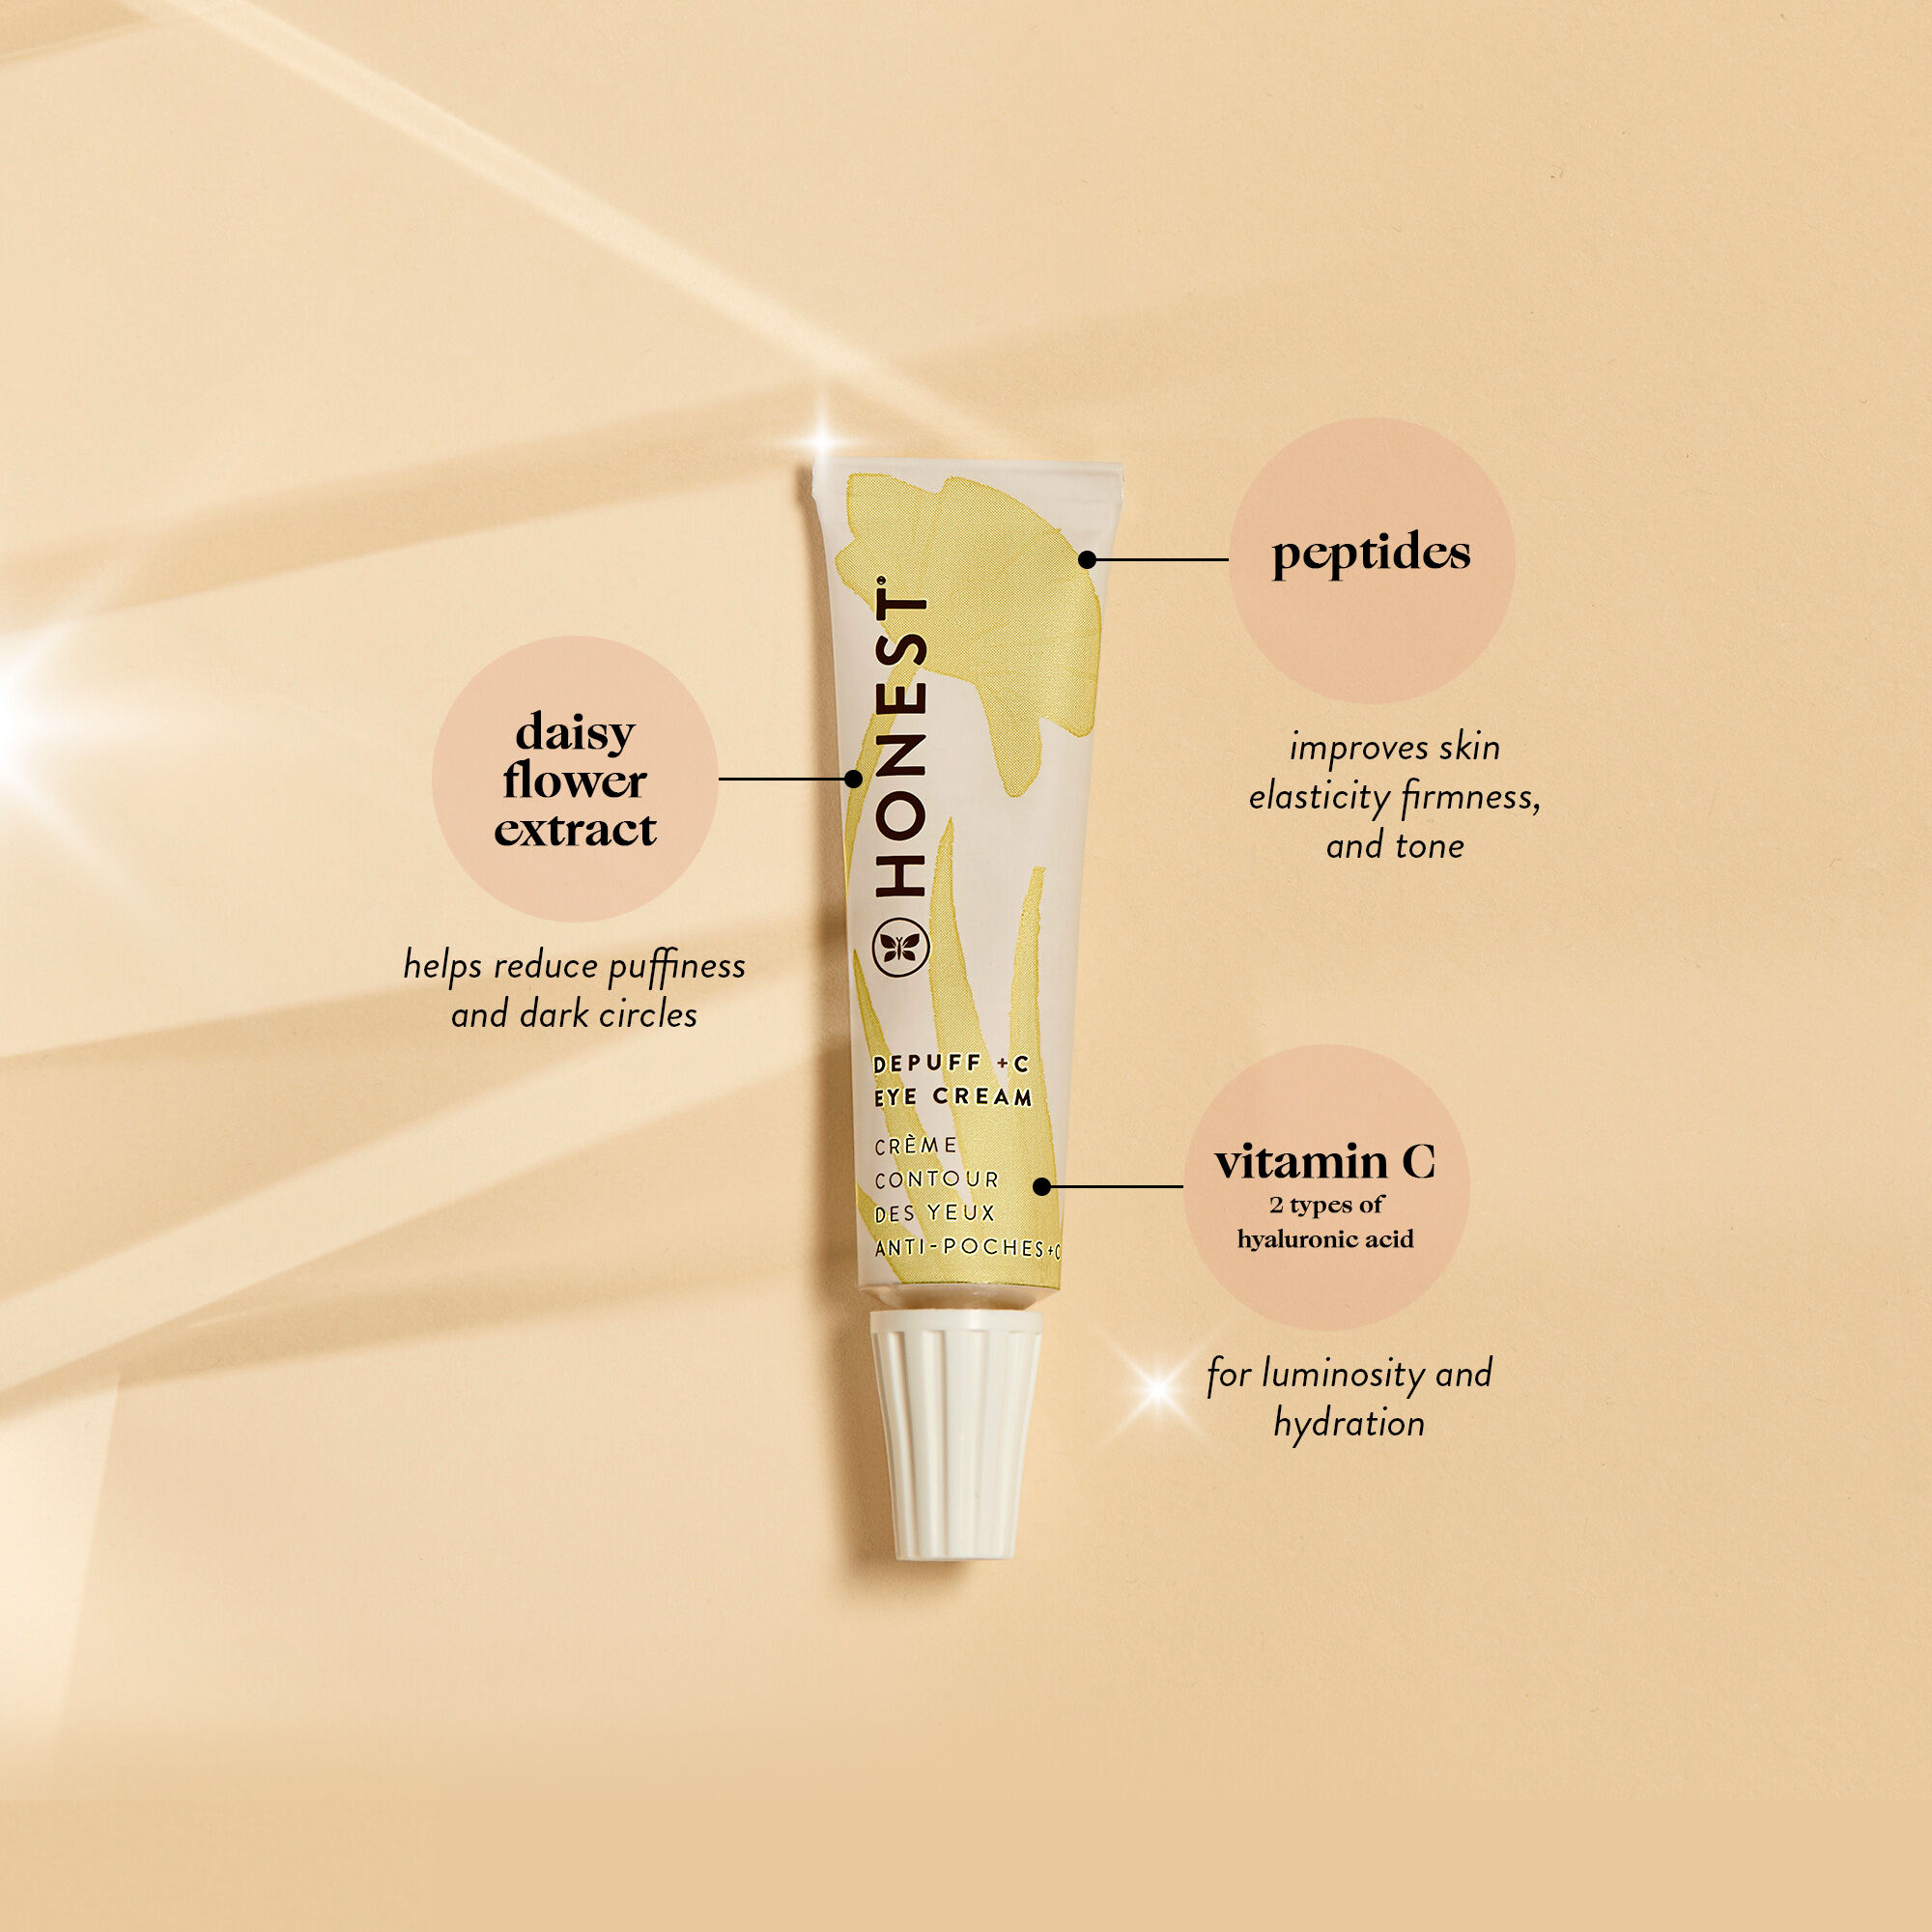 Depuff +C Eye Cream